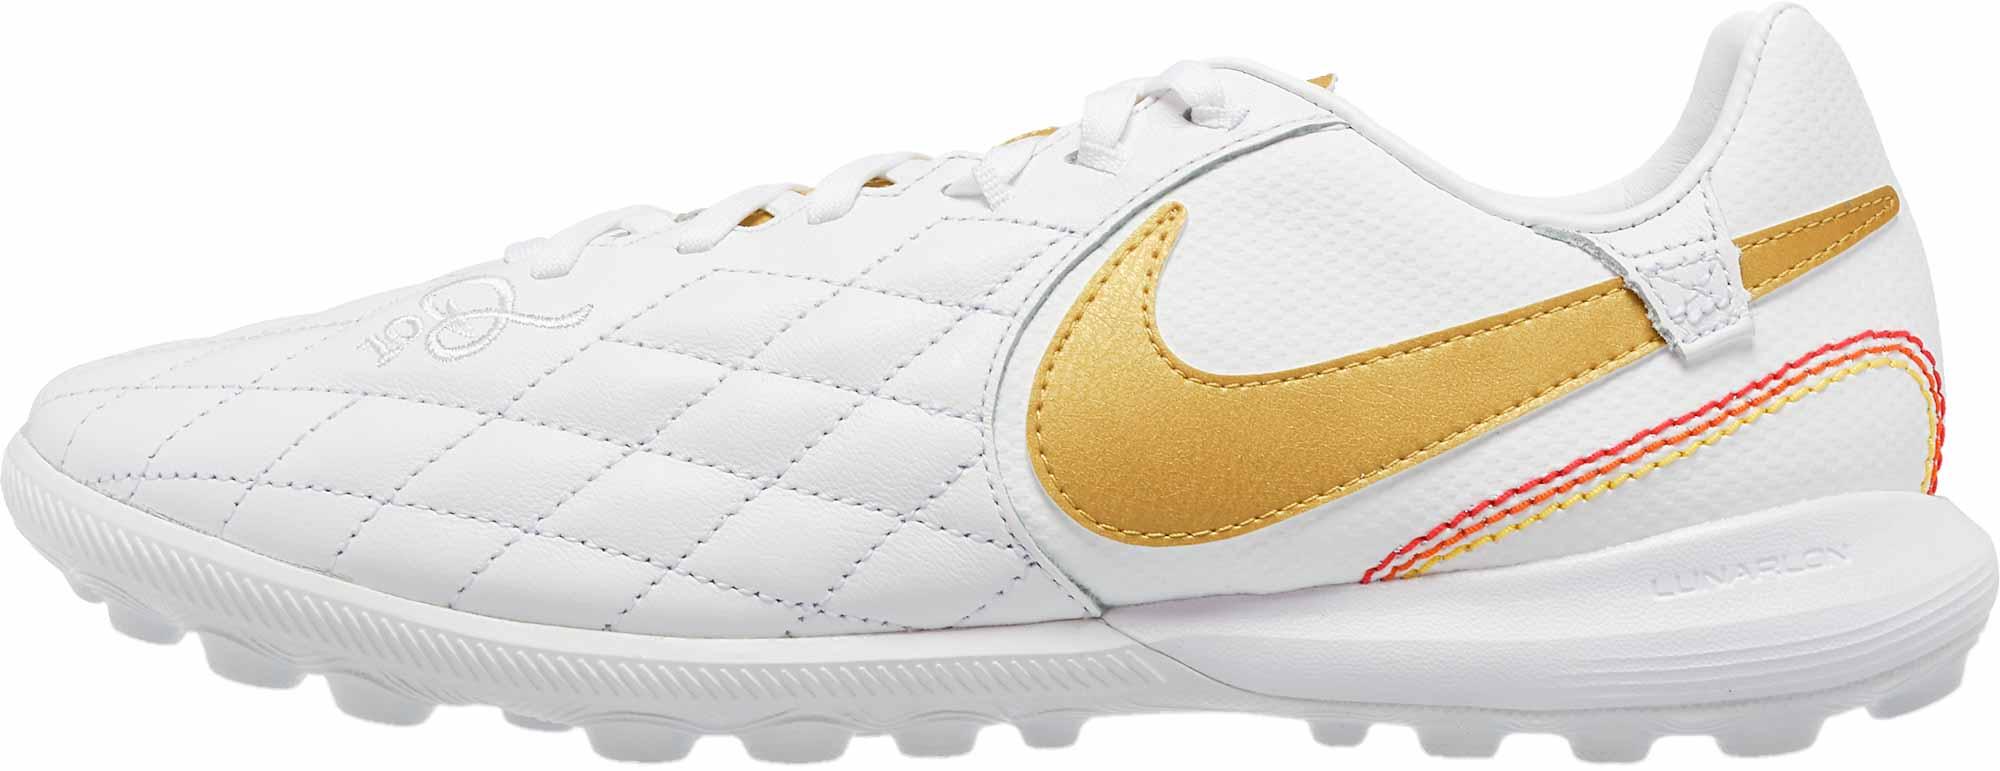 Nike Lunar Legendx 7 Pro Tf 10r White Metallic Gold